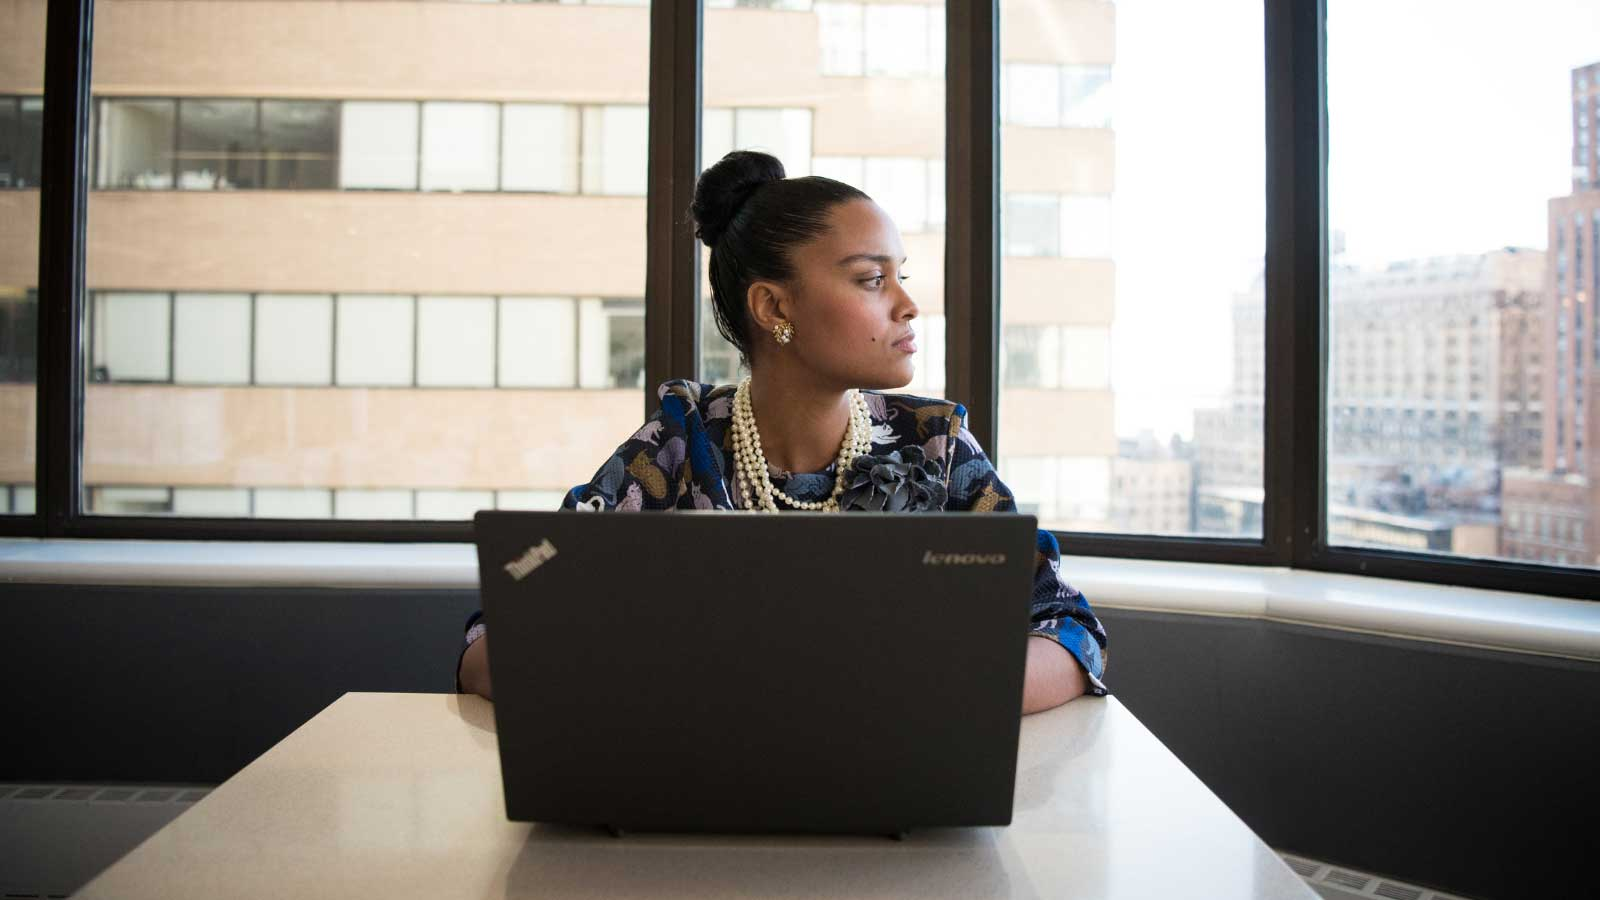 7 Factors to Consider When Choosing HR Case Management Software